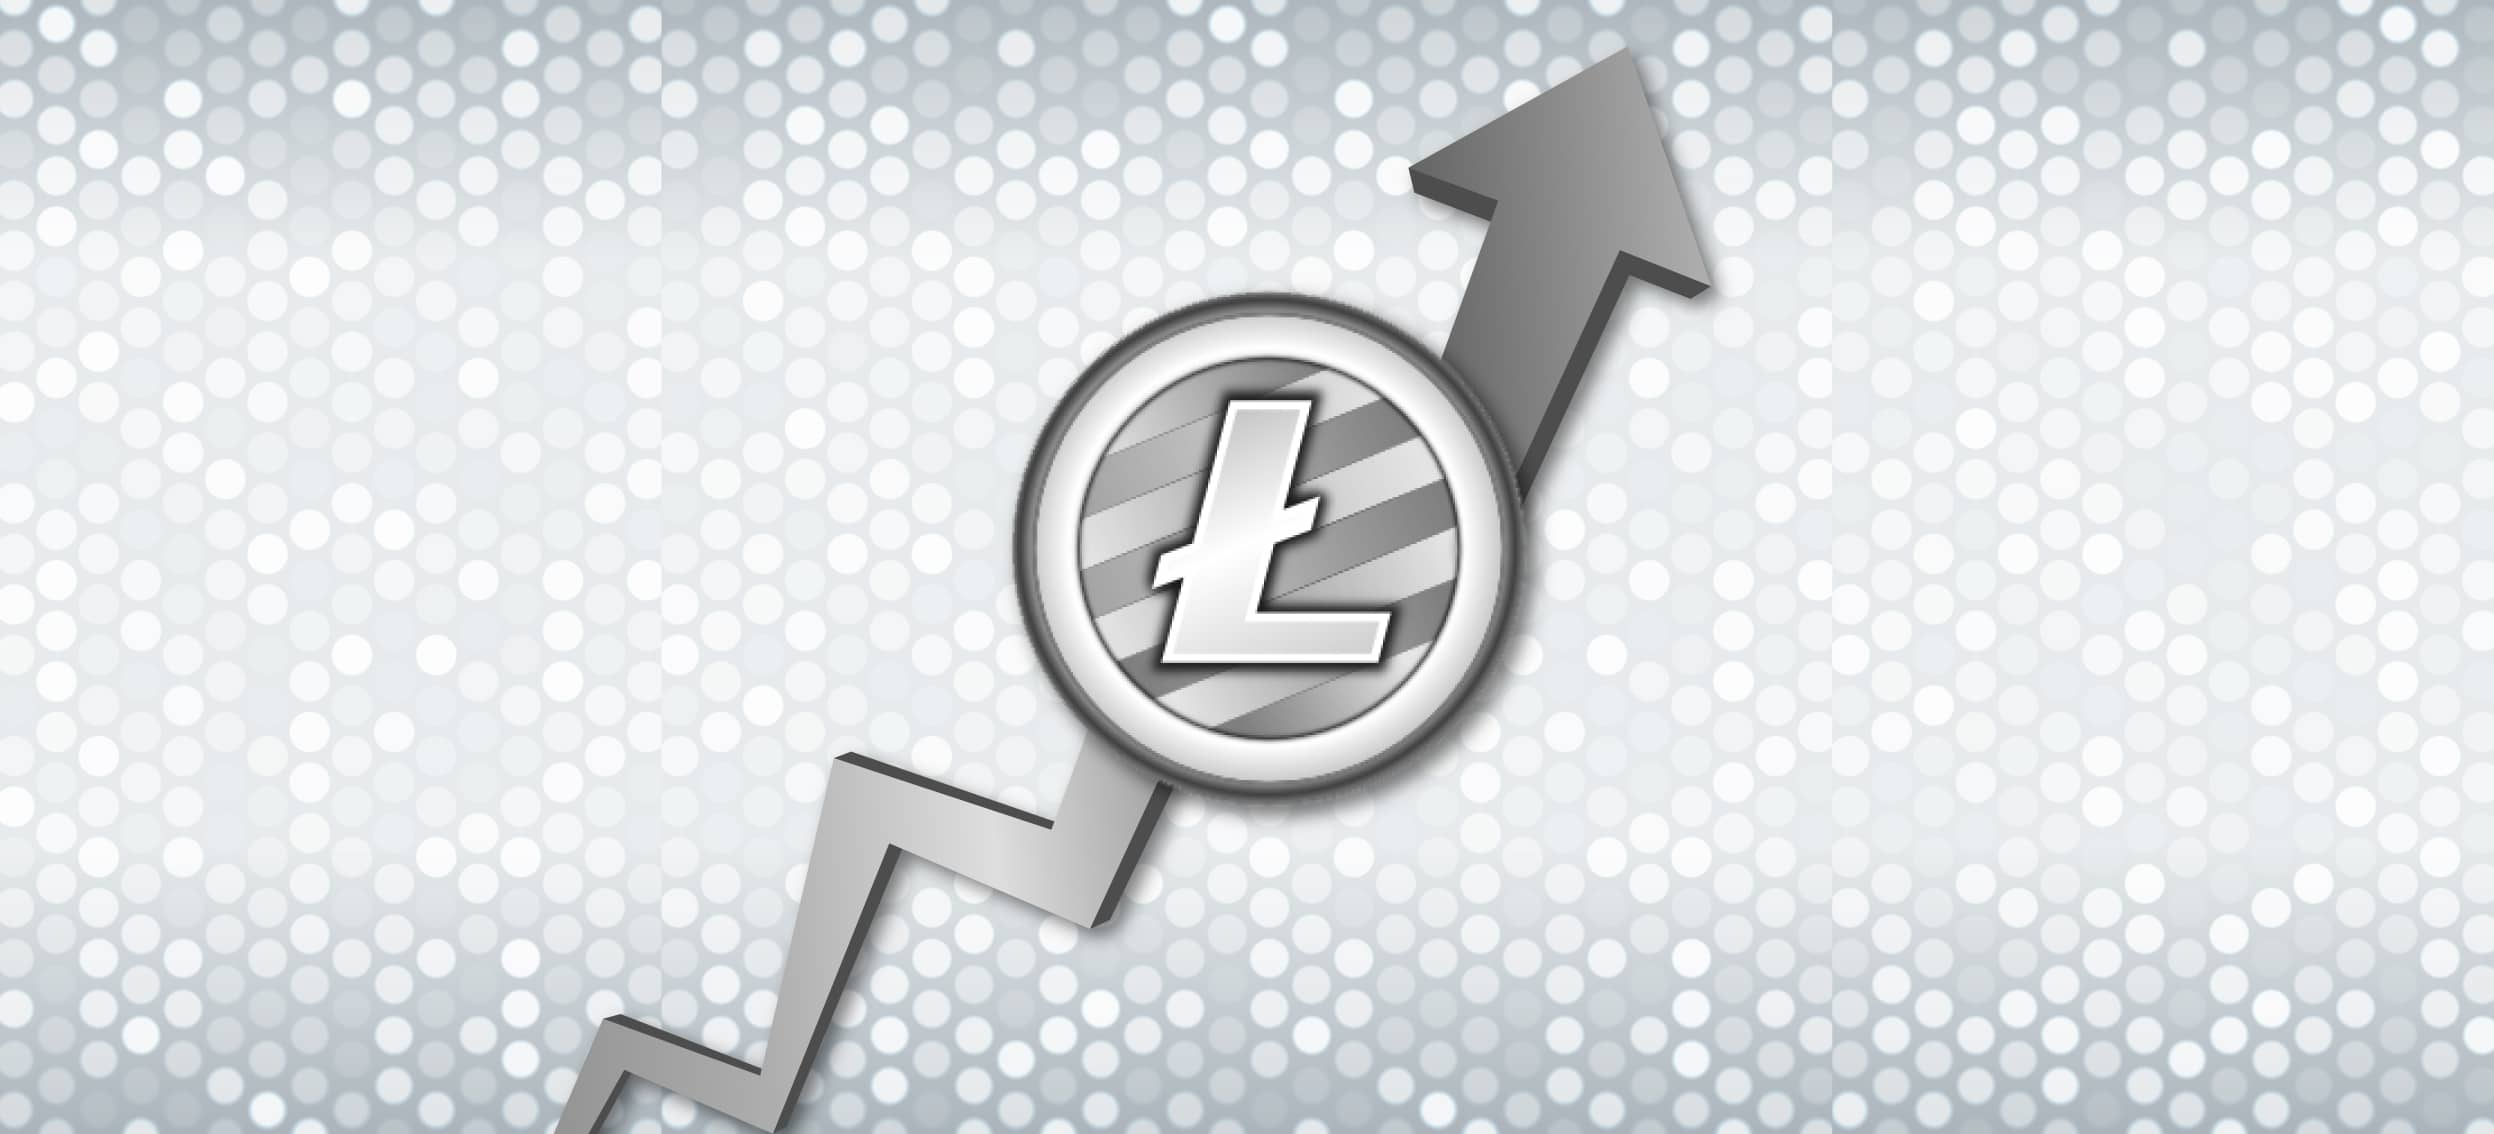 Litecoin LTC Vs. Ethereum ETH 2 - Litecoin (LTC) Vs. Ethereum (ETH) – Best Similarities And Differences